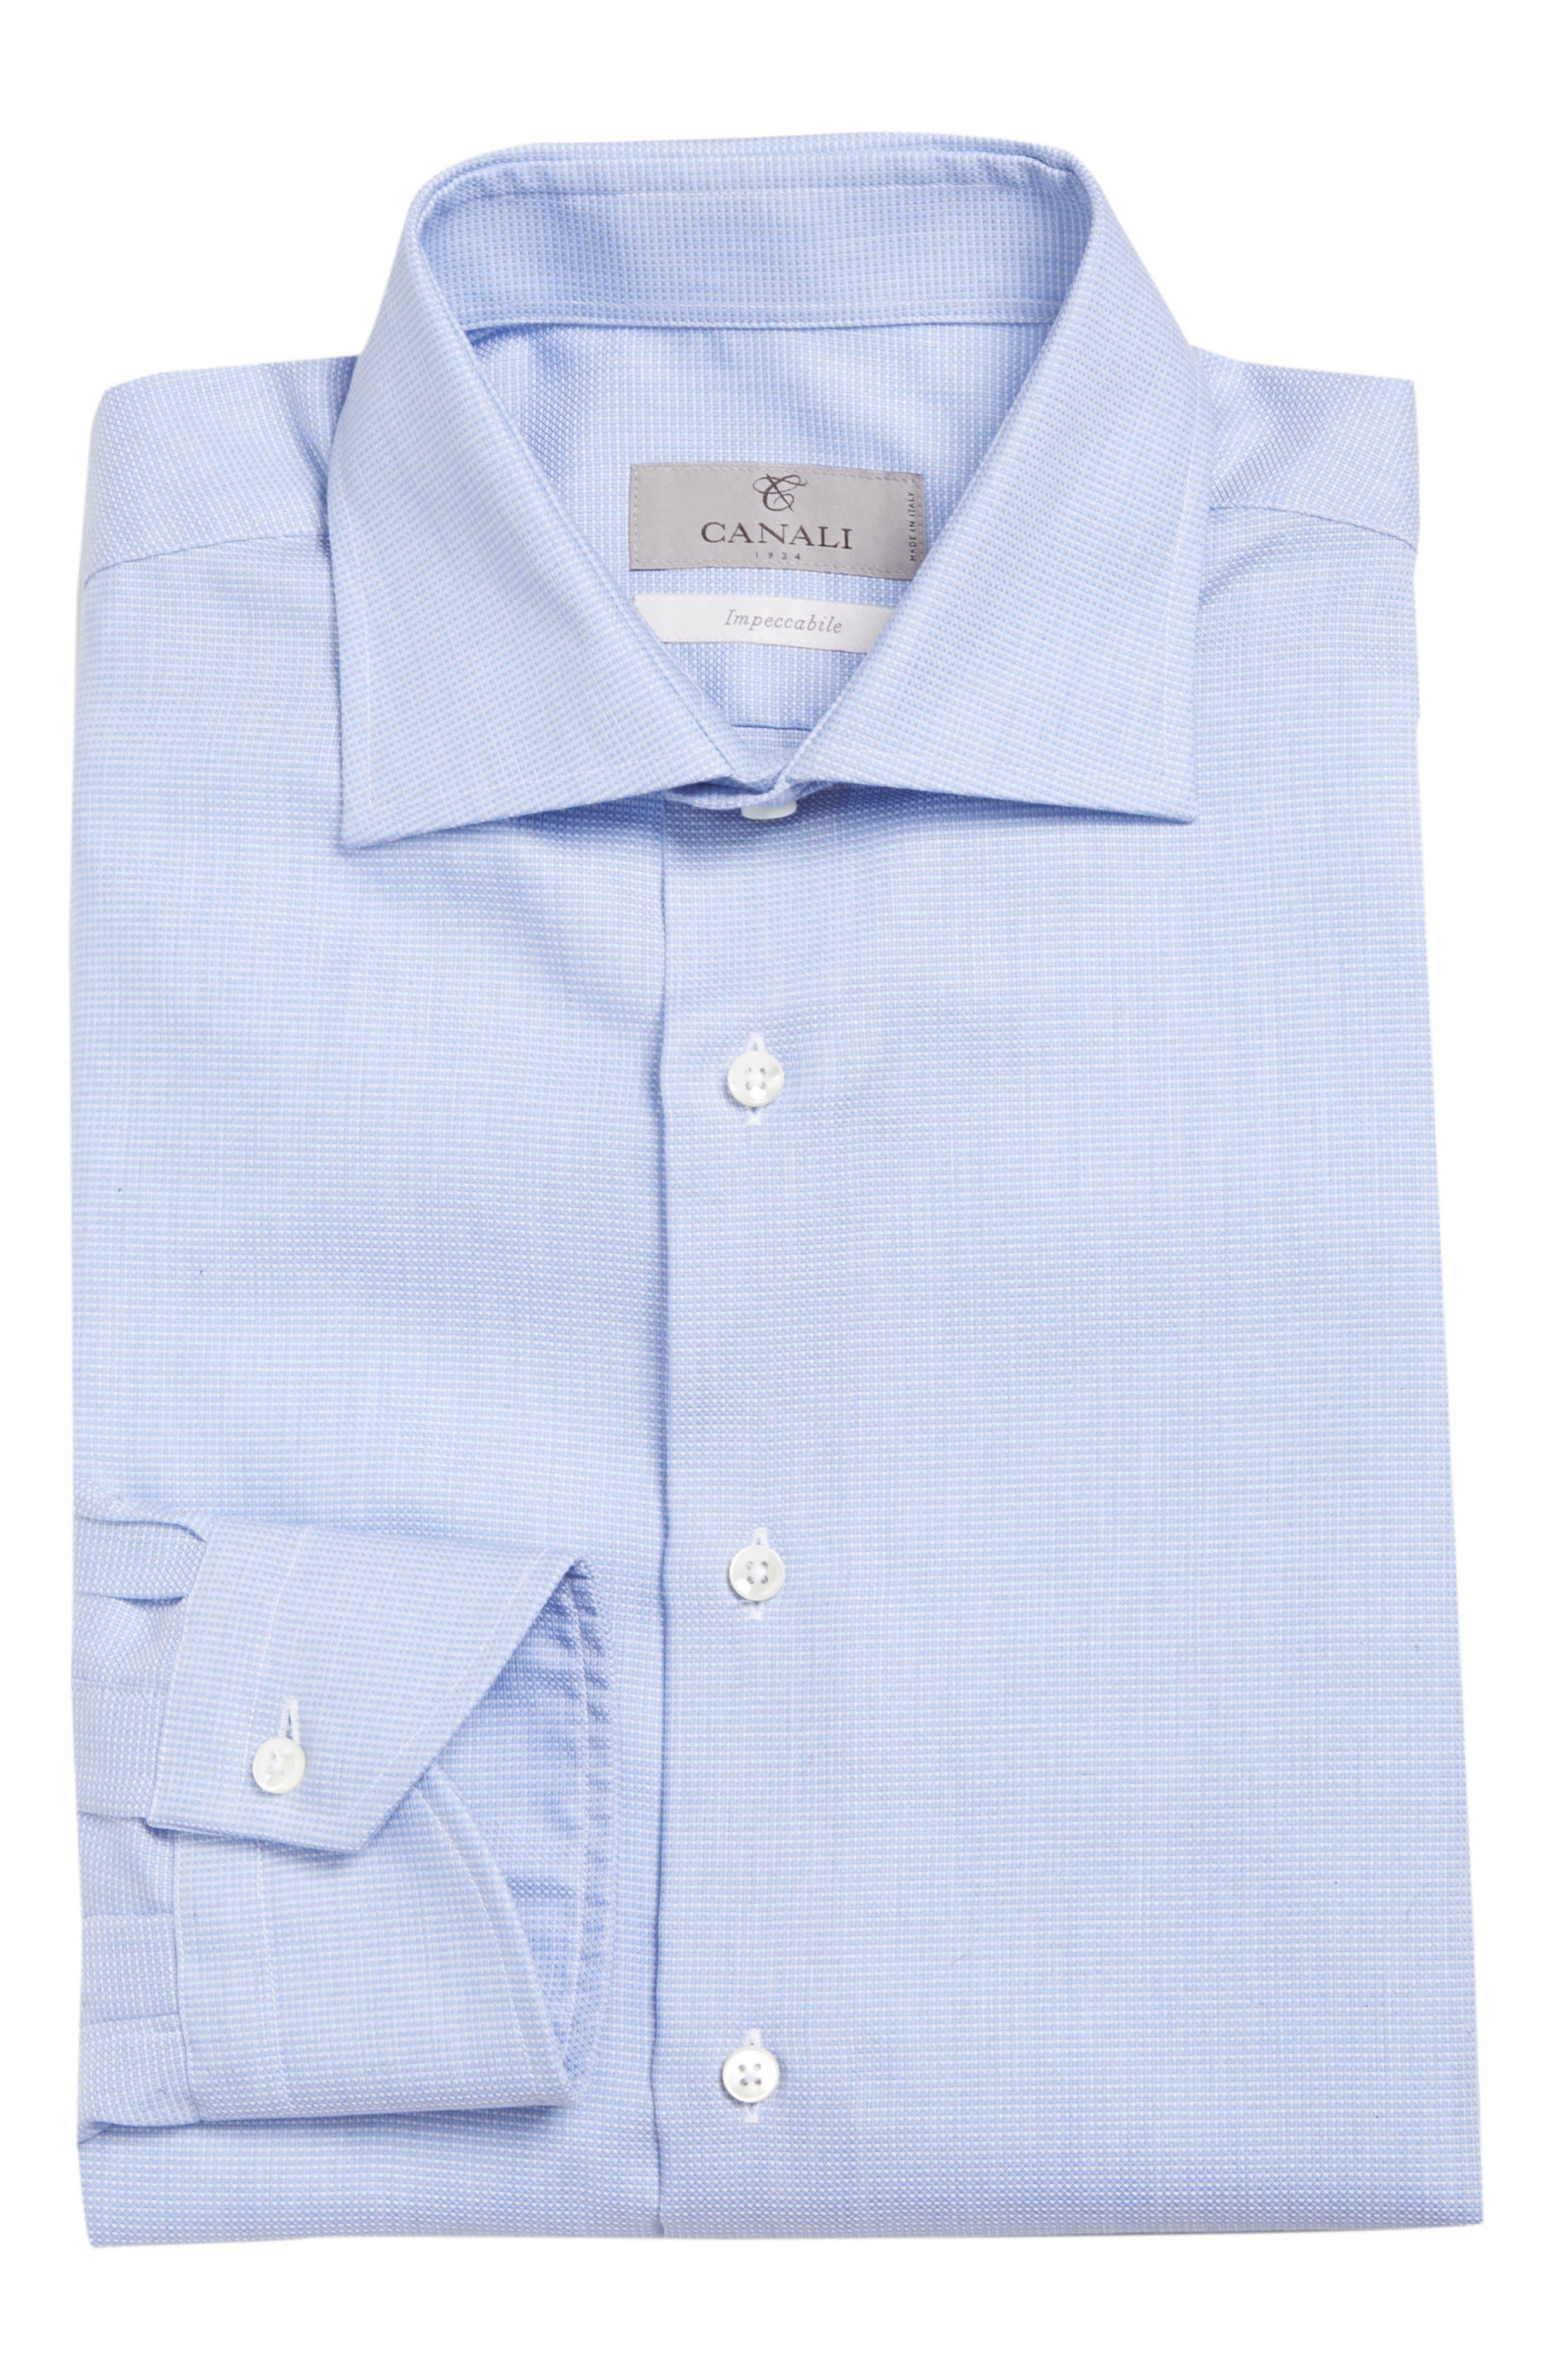 Regular Fit Solid Dress Shirt,                             Alternate thumbnail 5, color,